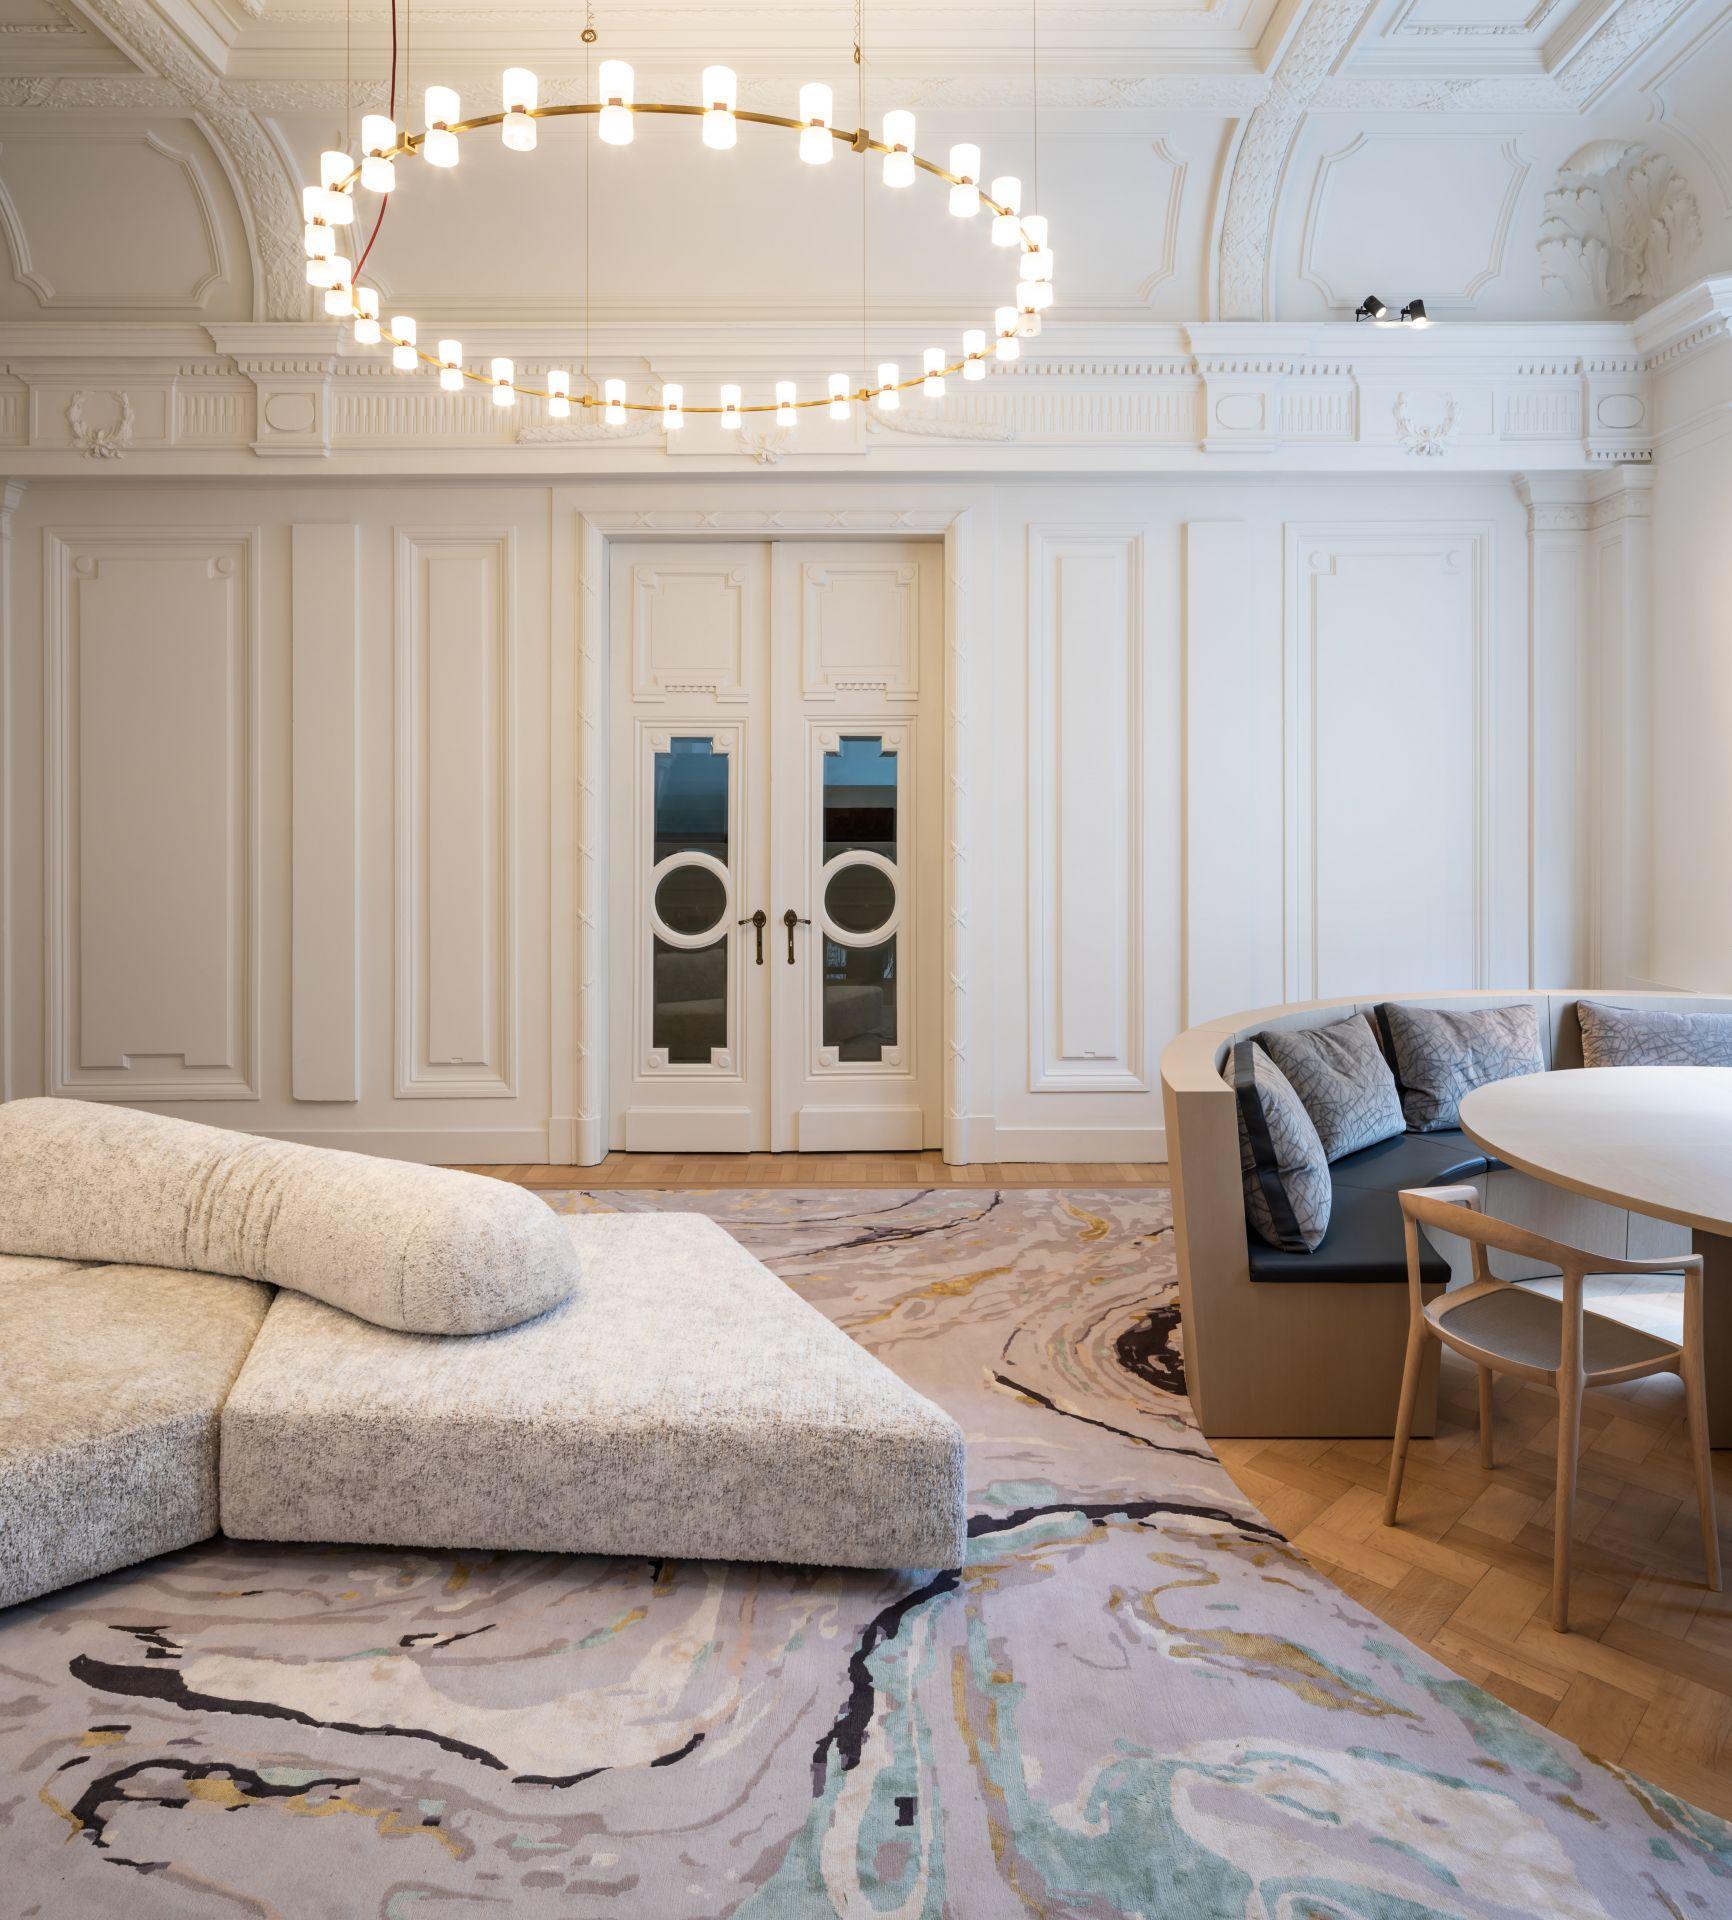 Appartamento ad Anversa - image 6